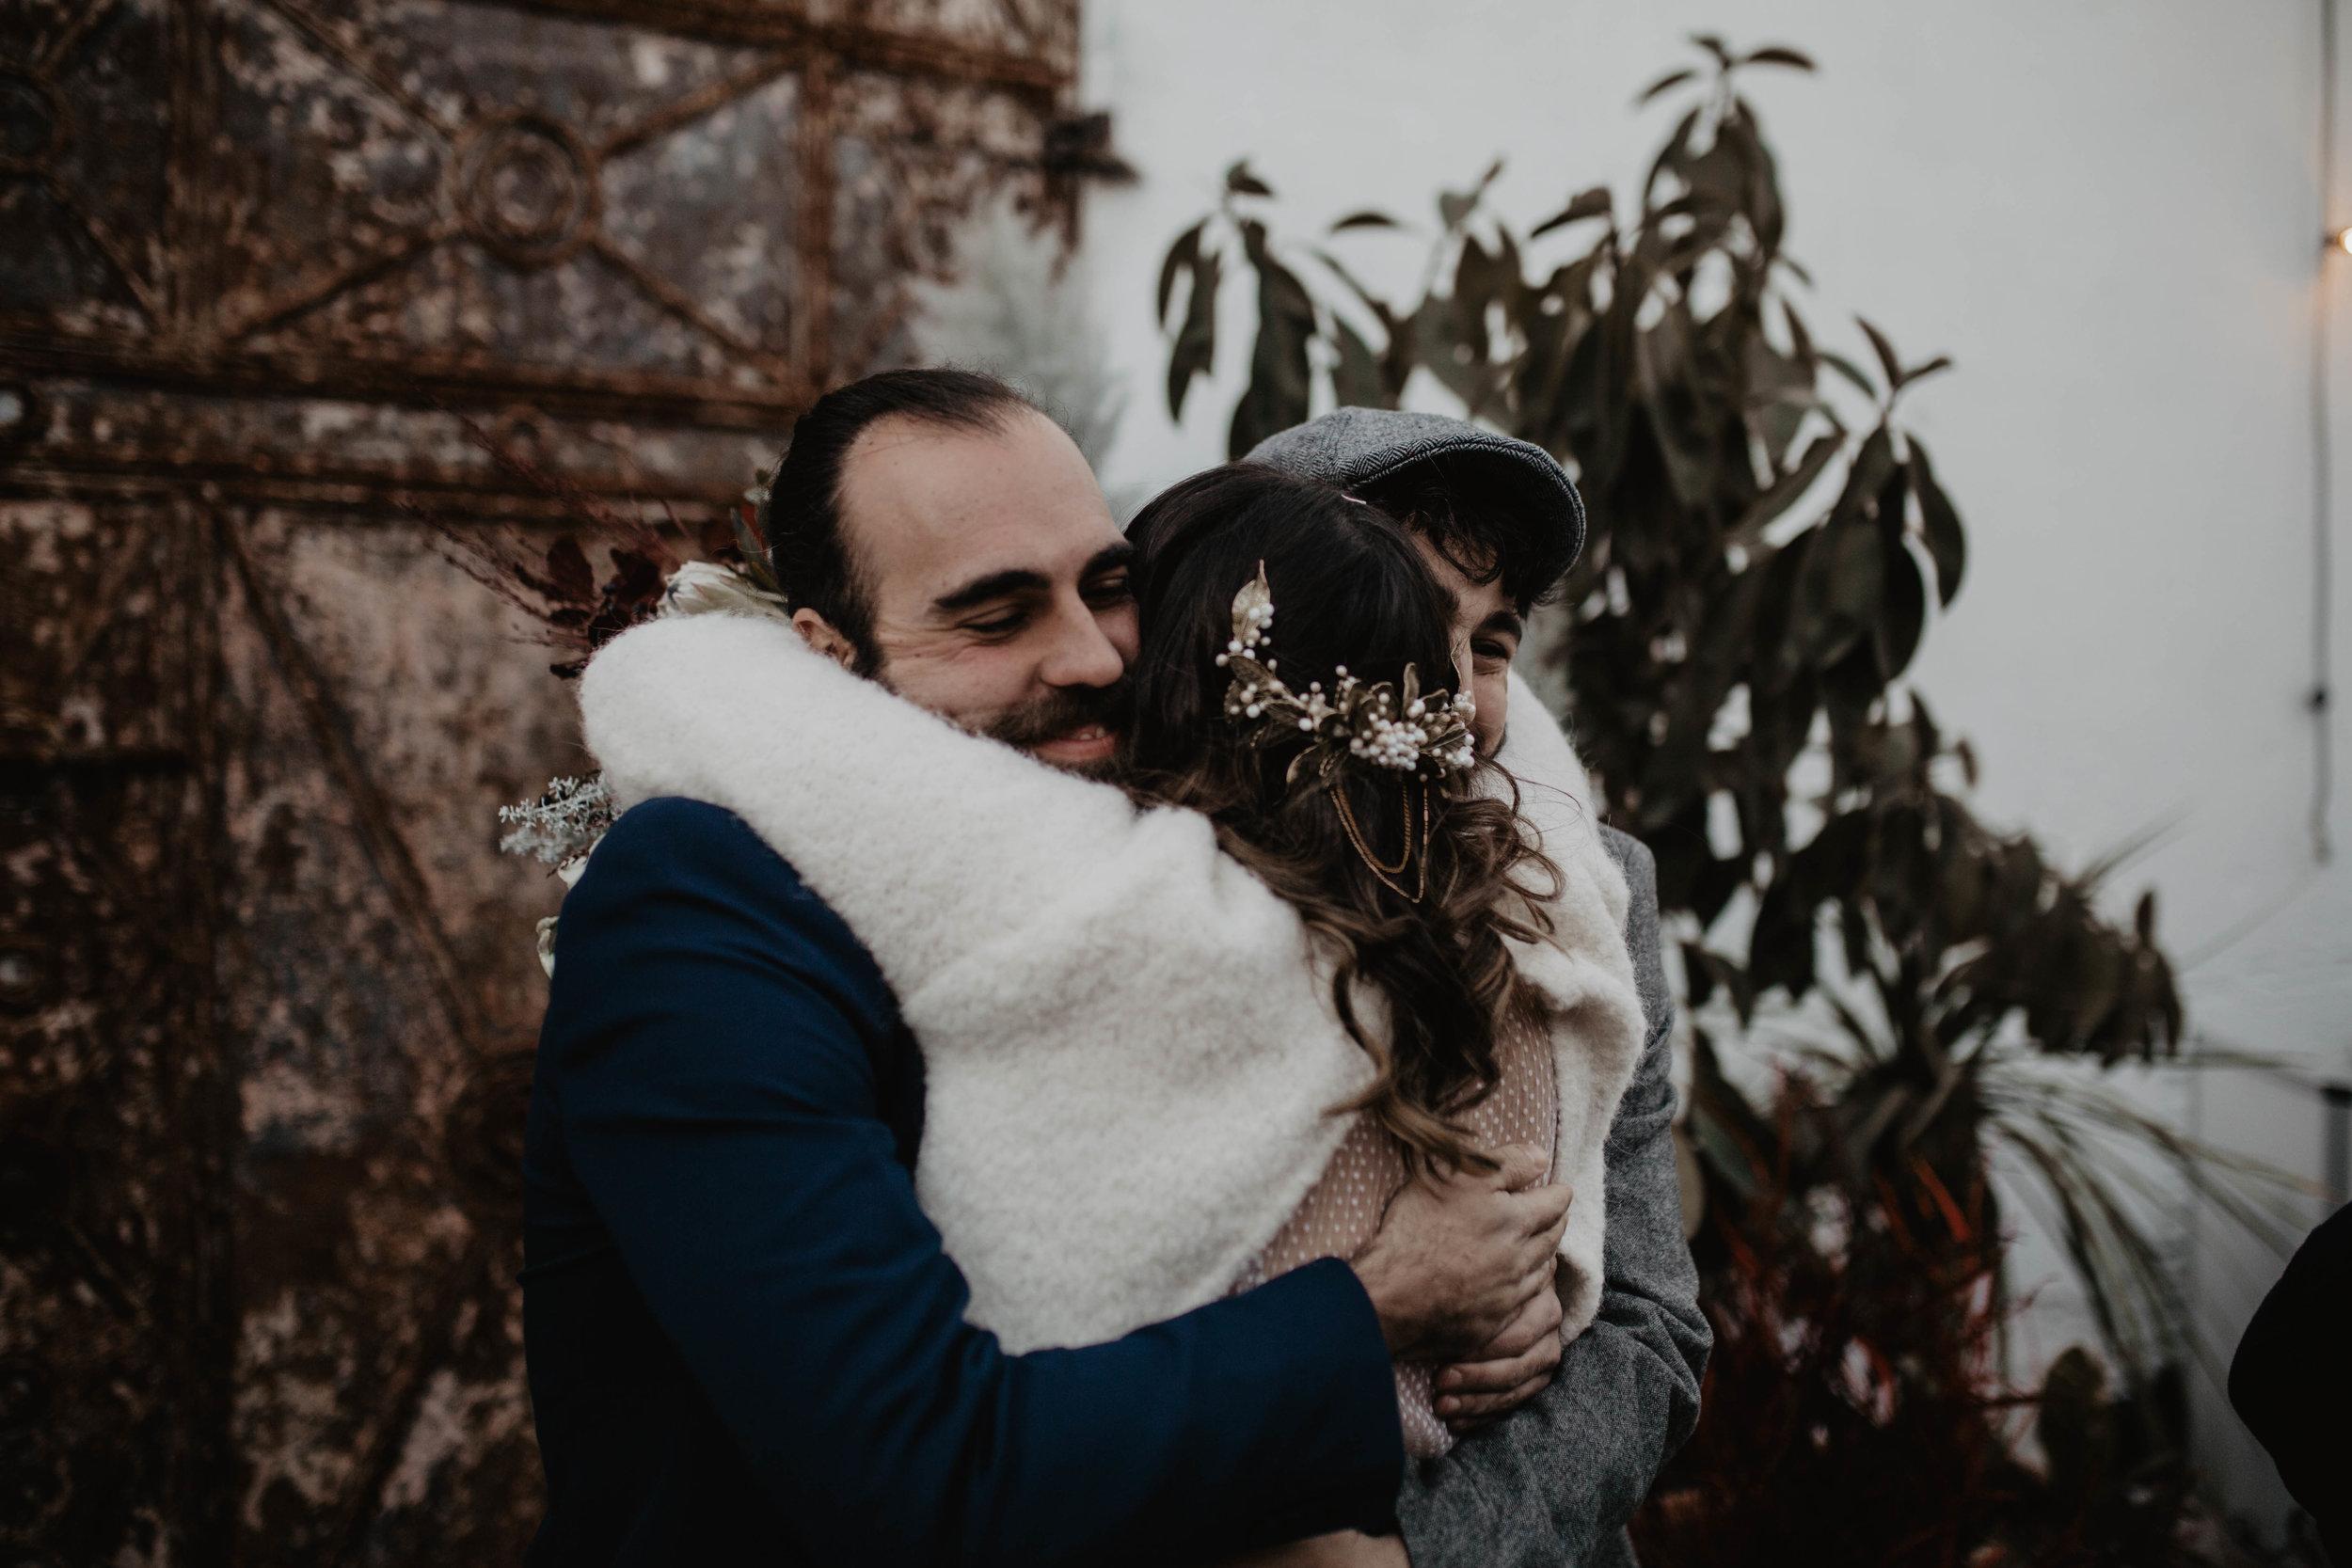 thenortherngirlphotography-photography-weddingphotography-couple-bodasconestilo-bodasenbarcelona-martadavid-687.jpg